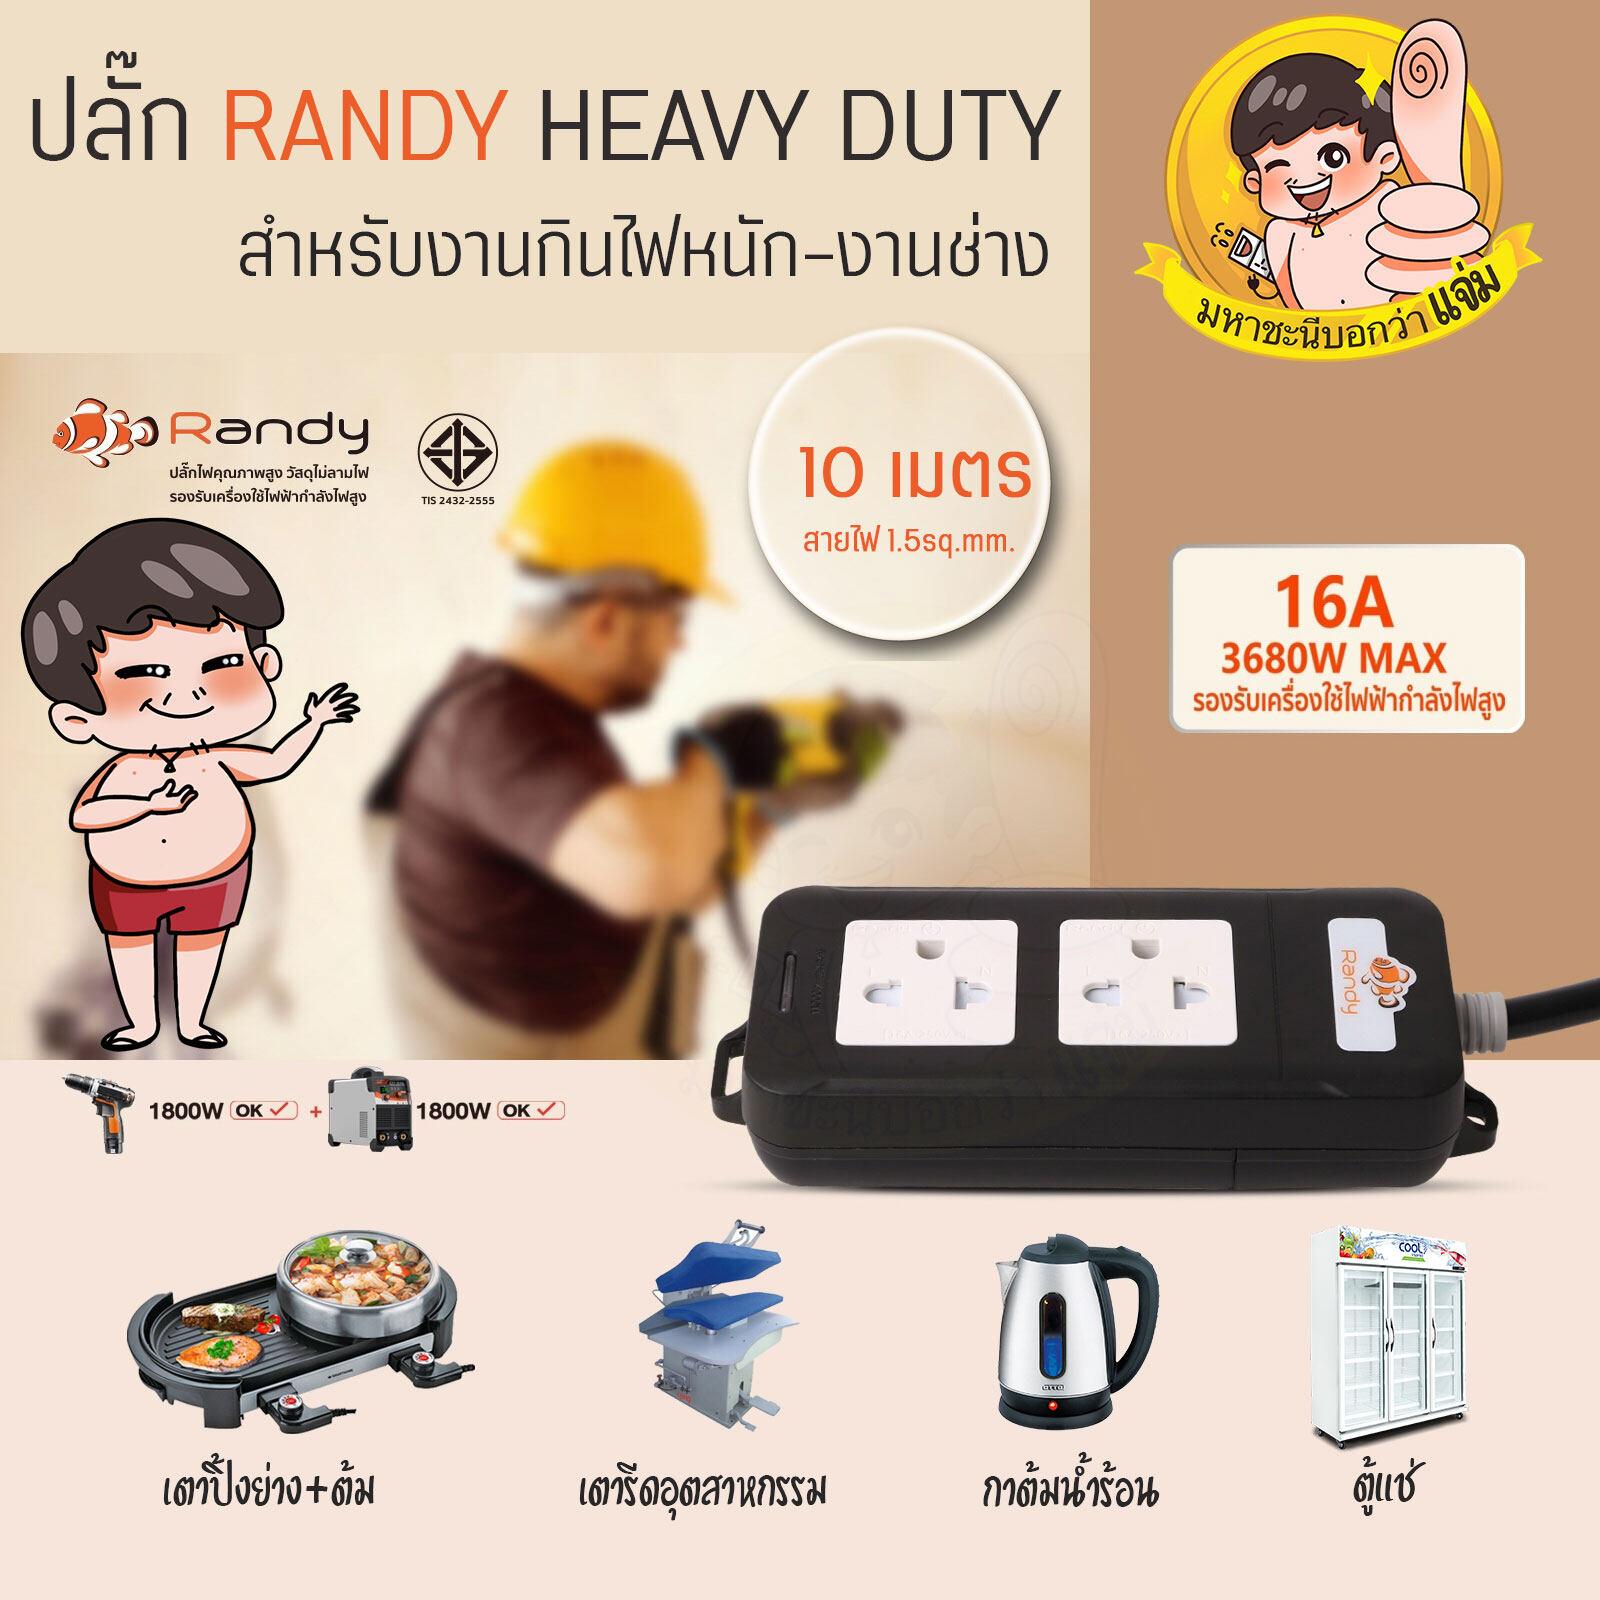 Randy Heavy Duty 16A สายไฟแท้ 100%ทองแดง VCT1.5mm²X3สาย 10 เมตร